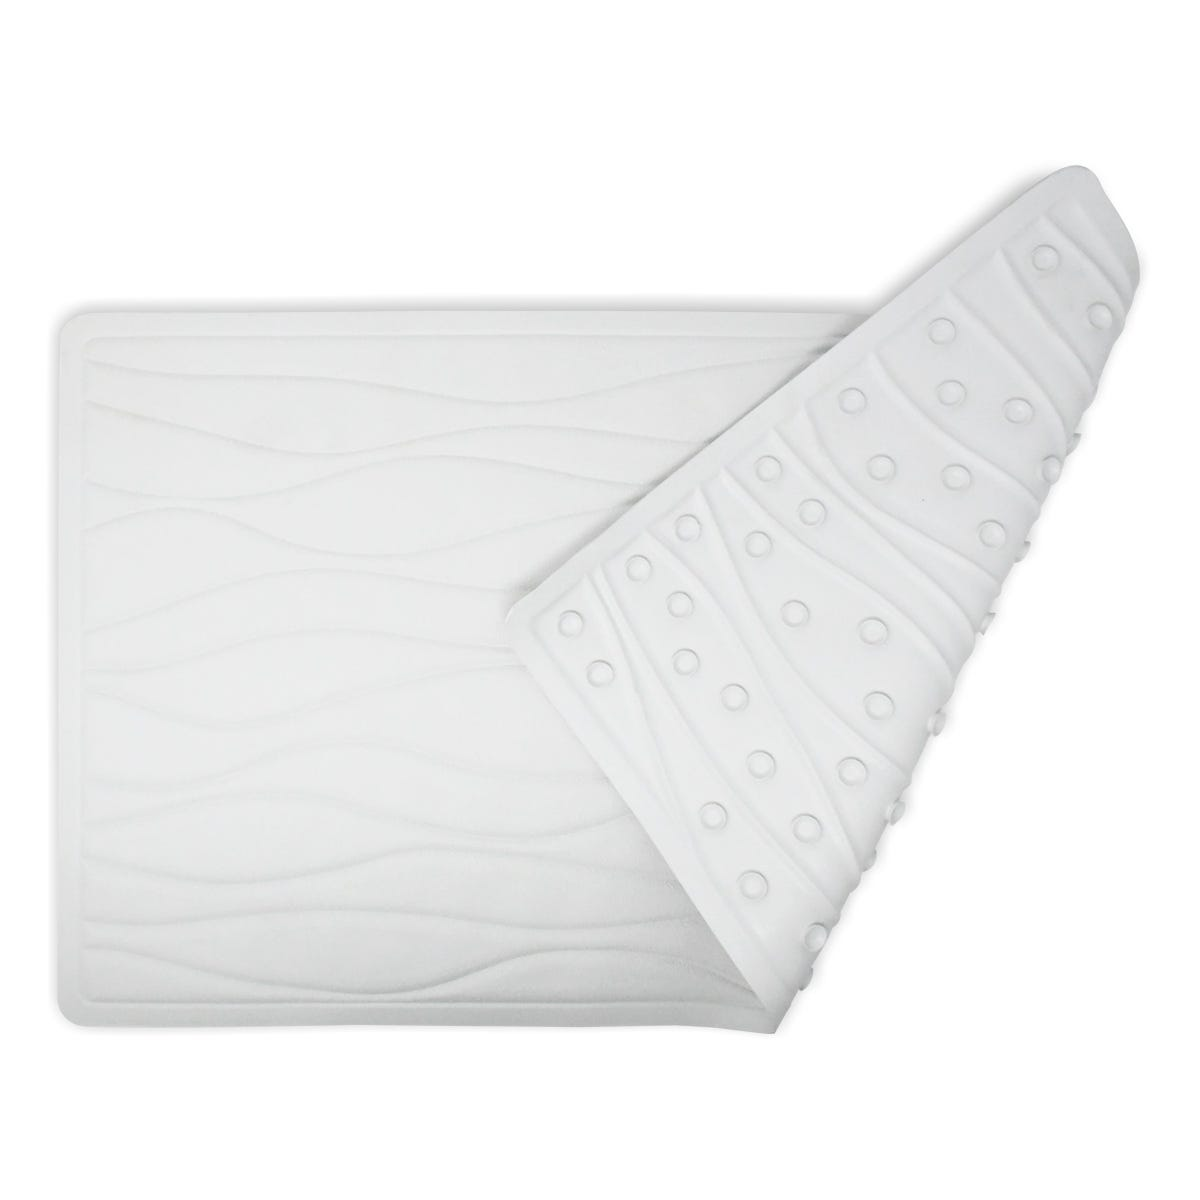 Tapete de baño de algodón Carnation Home Fashions color blanco